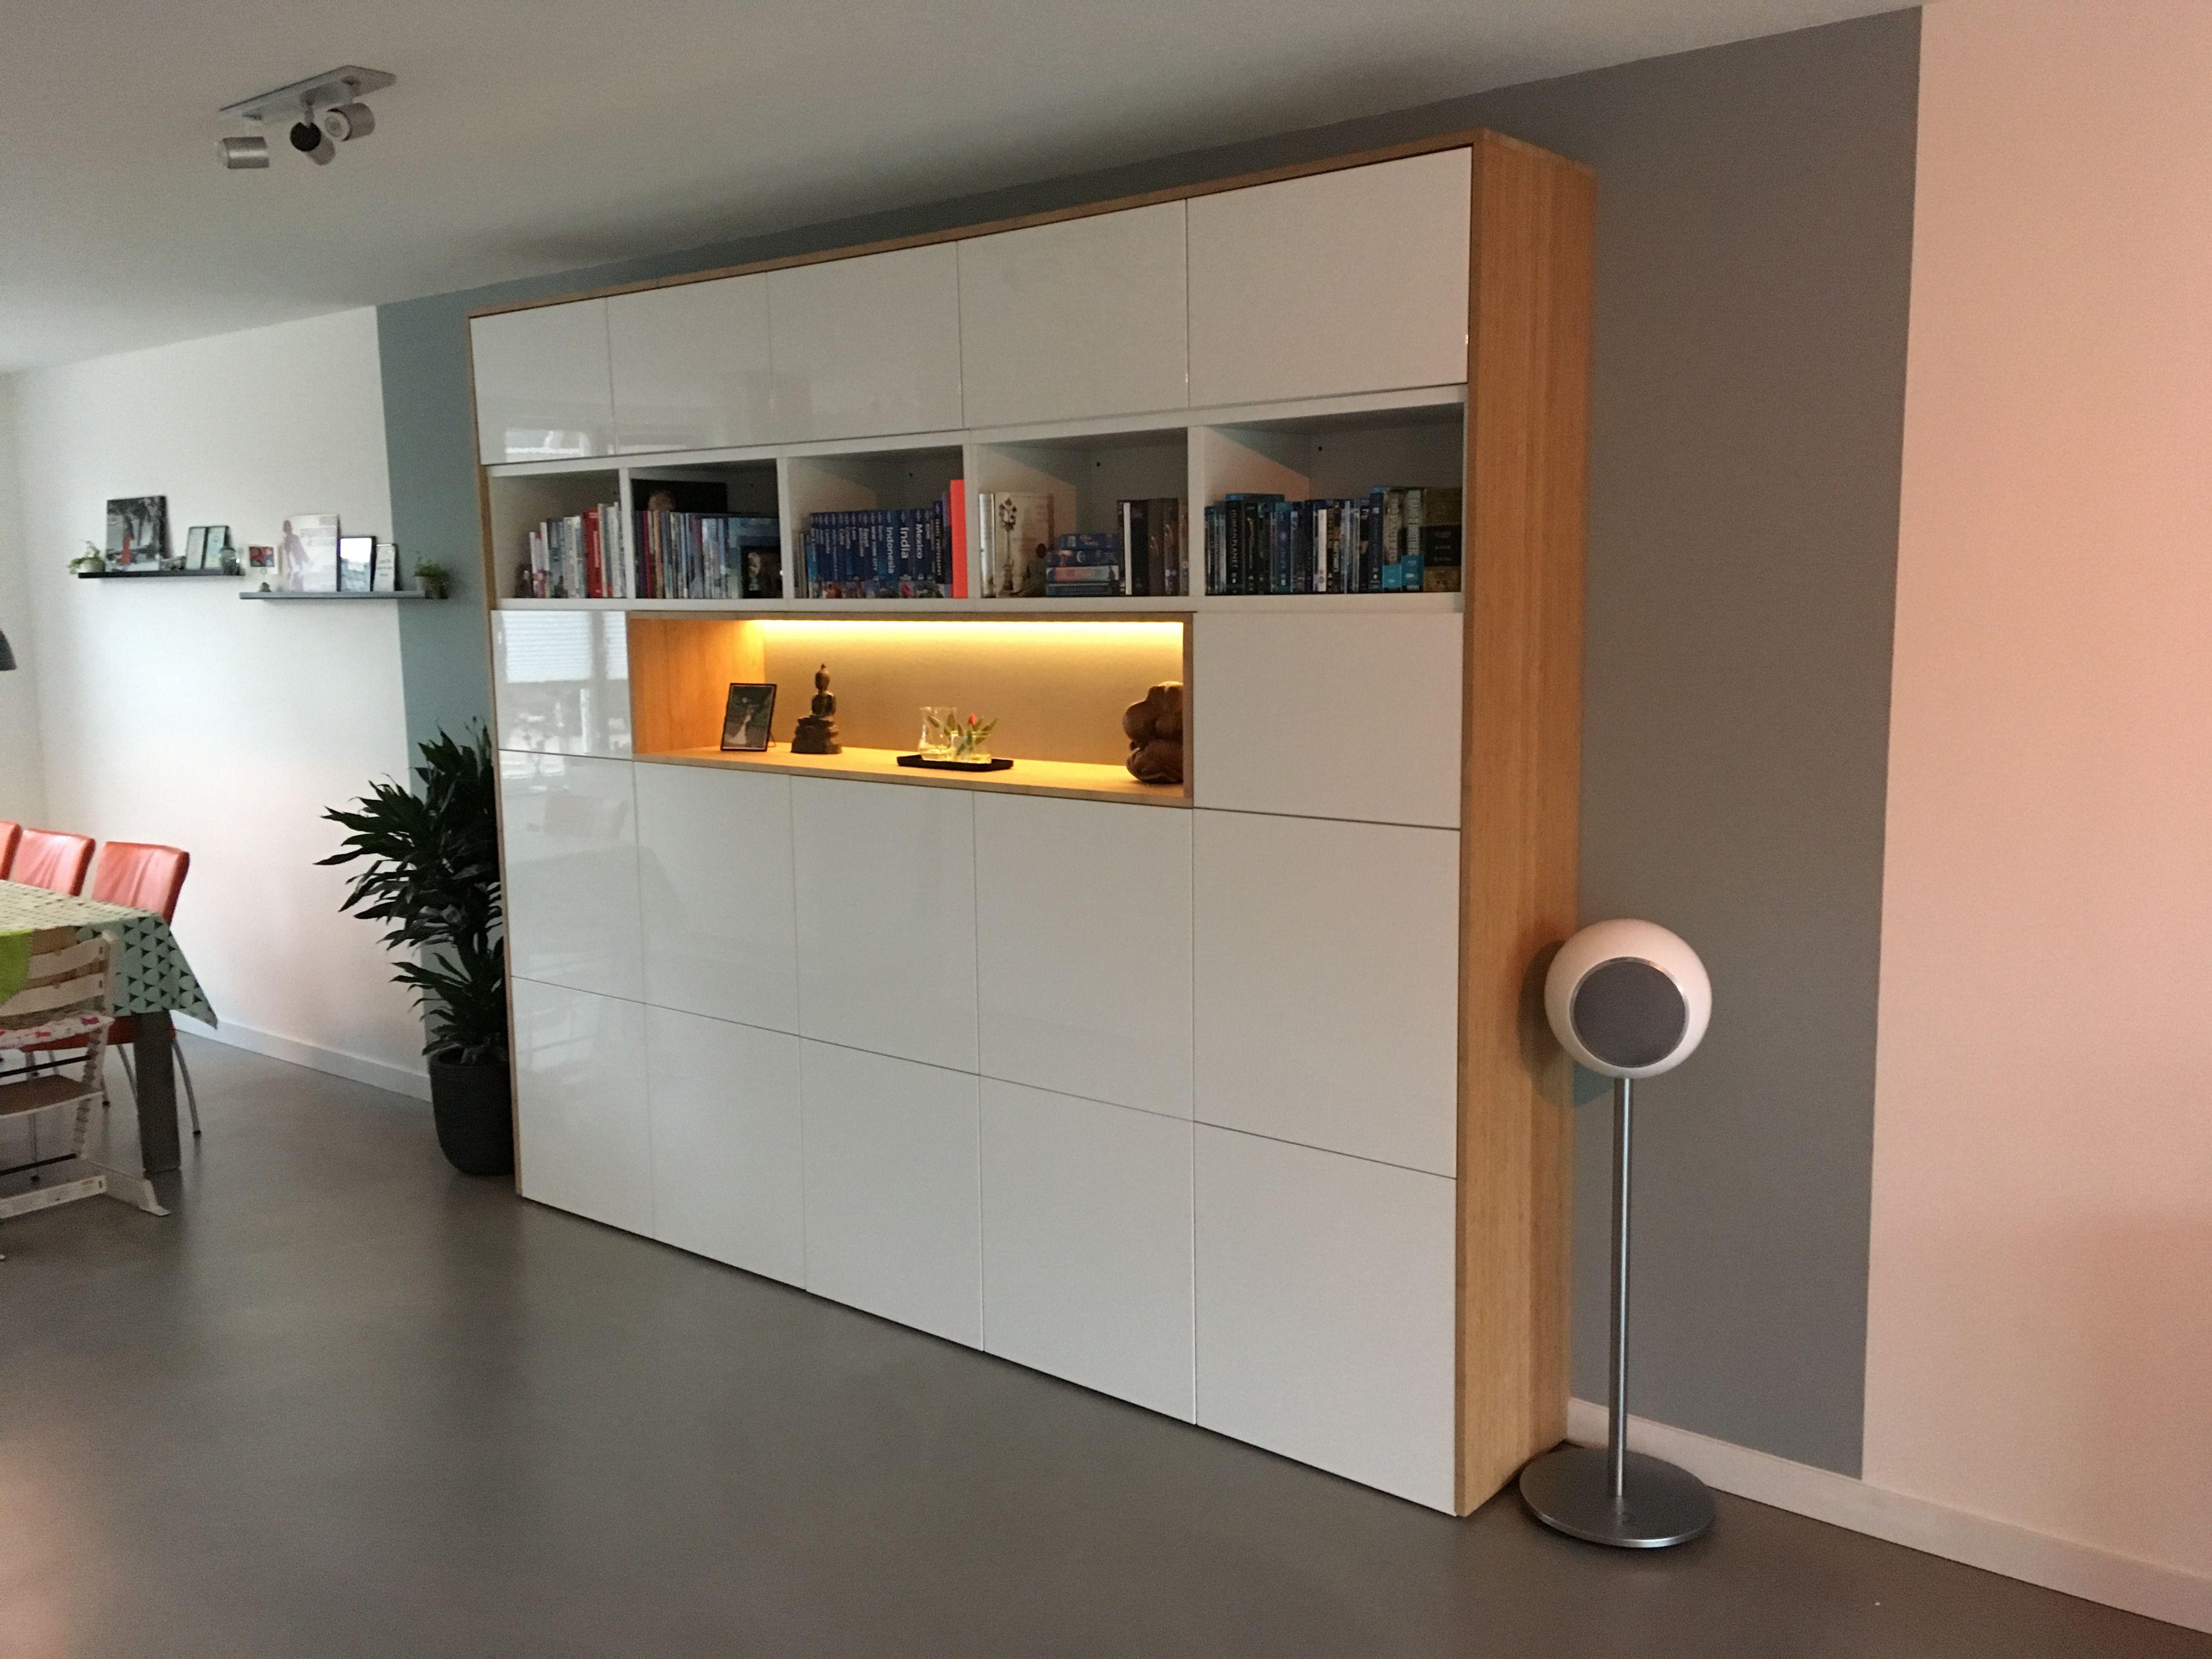 Vitrinekast Hangend Ikea.Ikeahack Ikea Besta Kast Met Bamboe Ombouw En Inbouw Woonkamer In